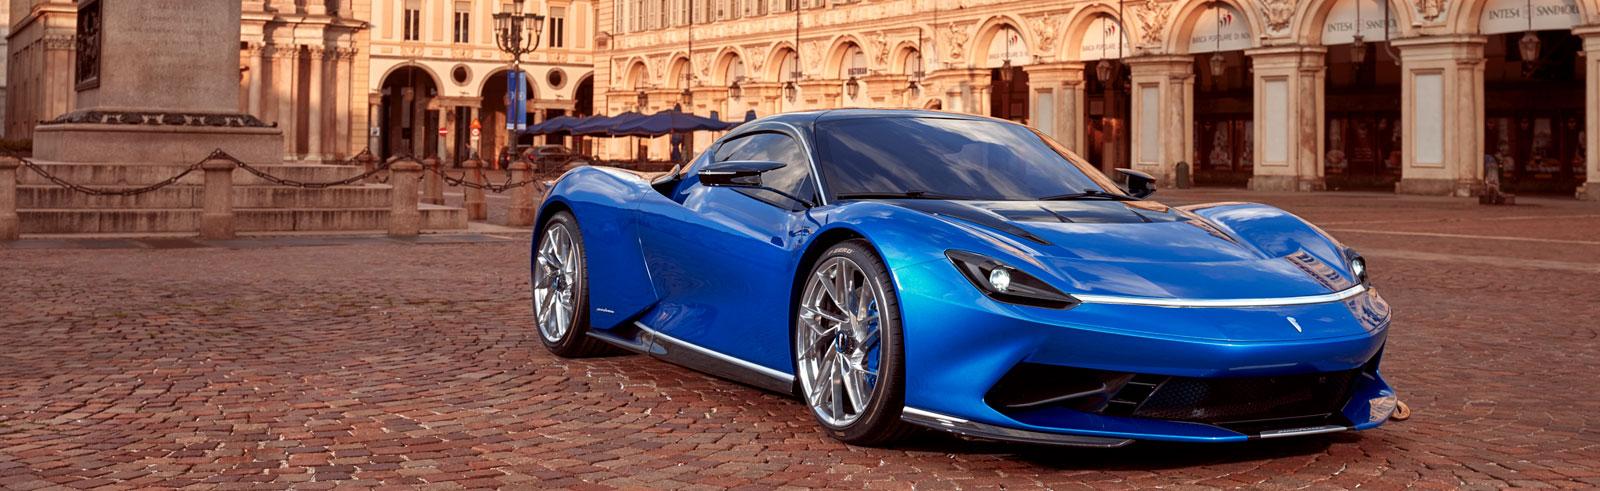 Automobili Pininfarina's Battista will make its public debut on August 16th